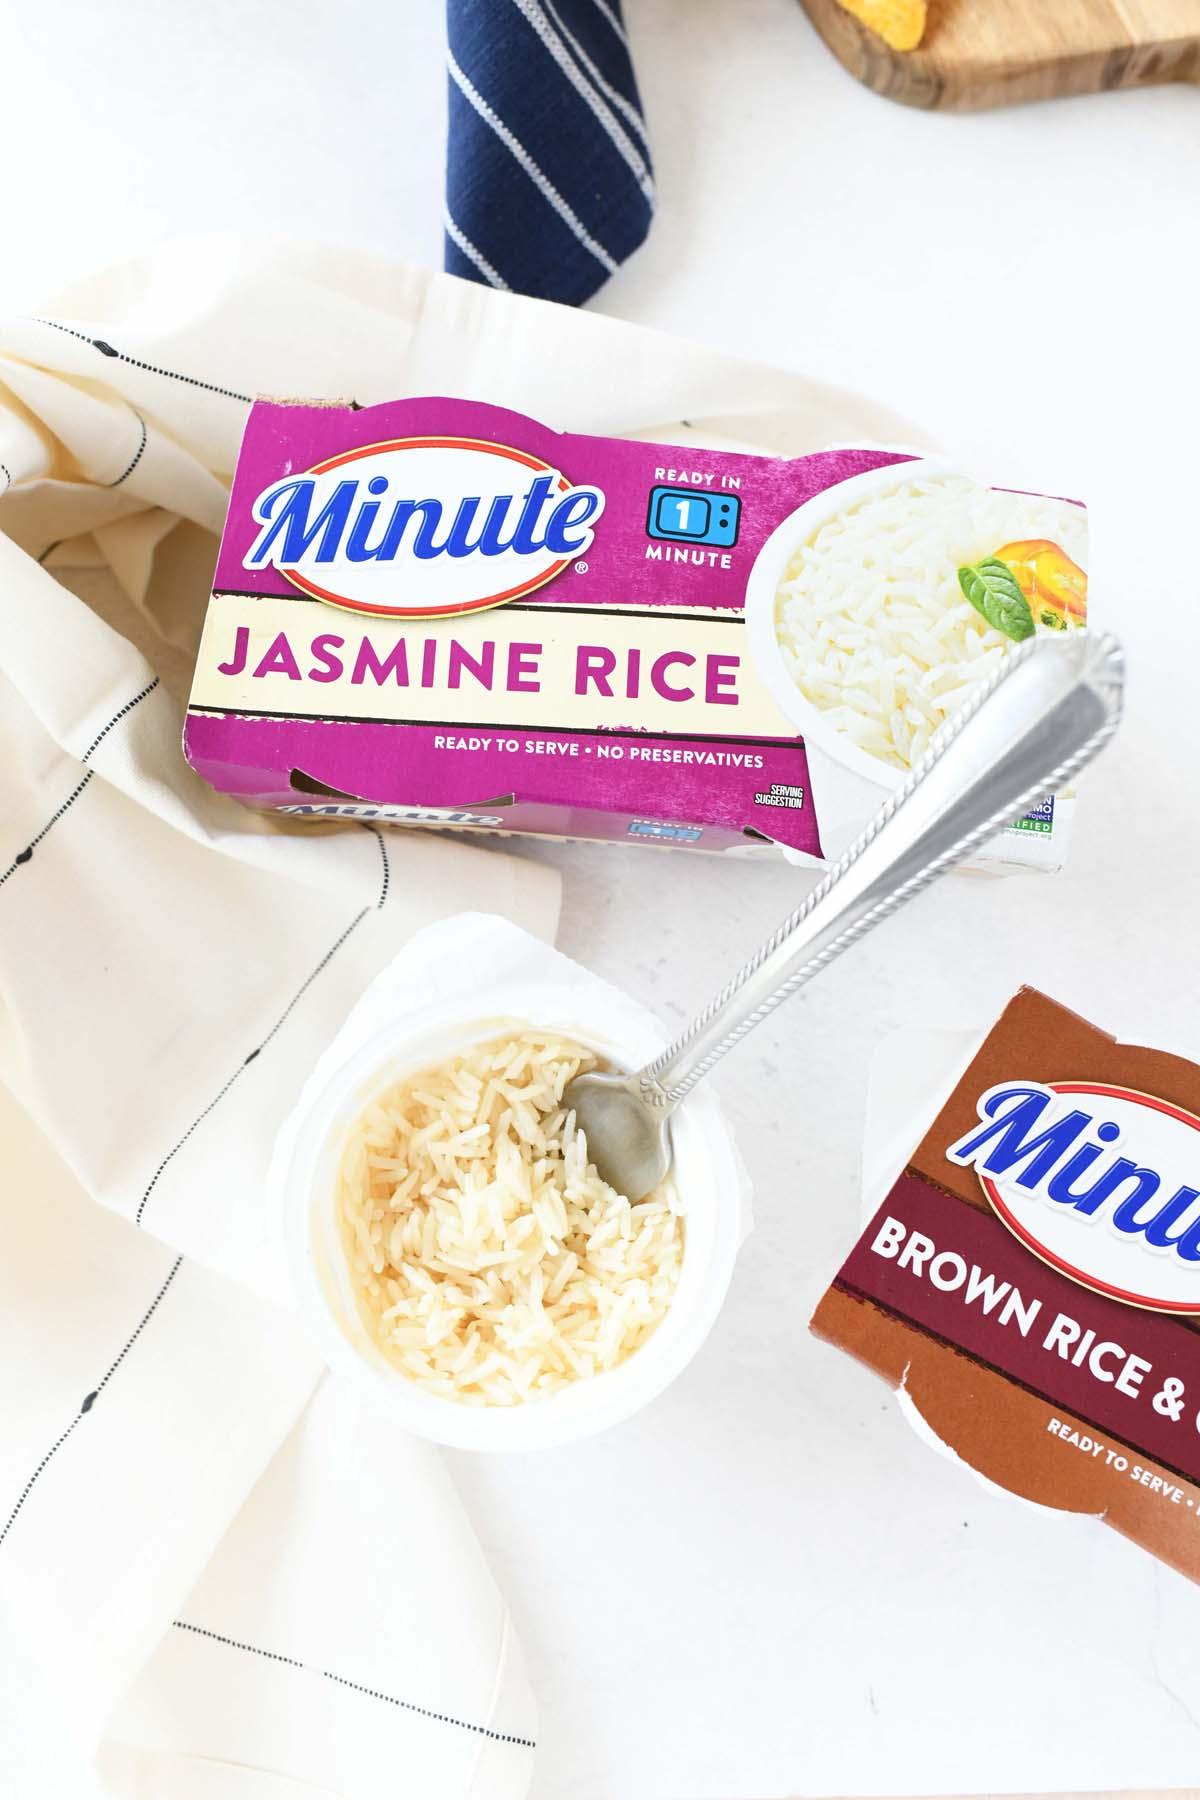 Minute Jasmine Rice cups